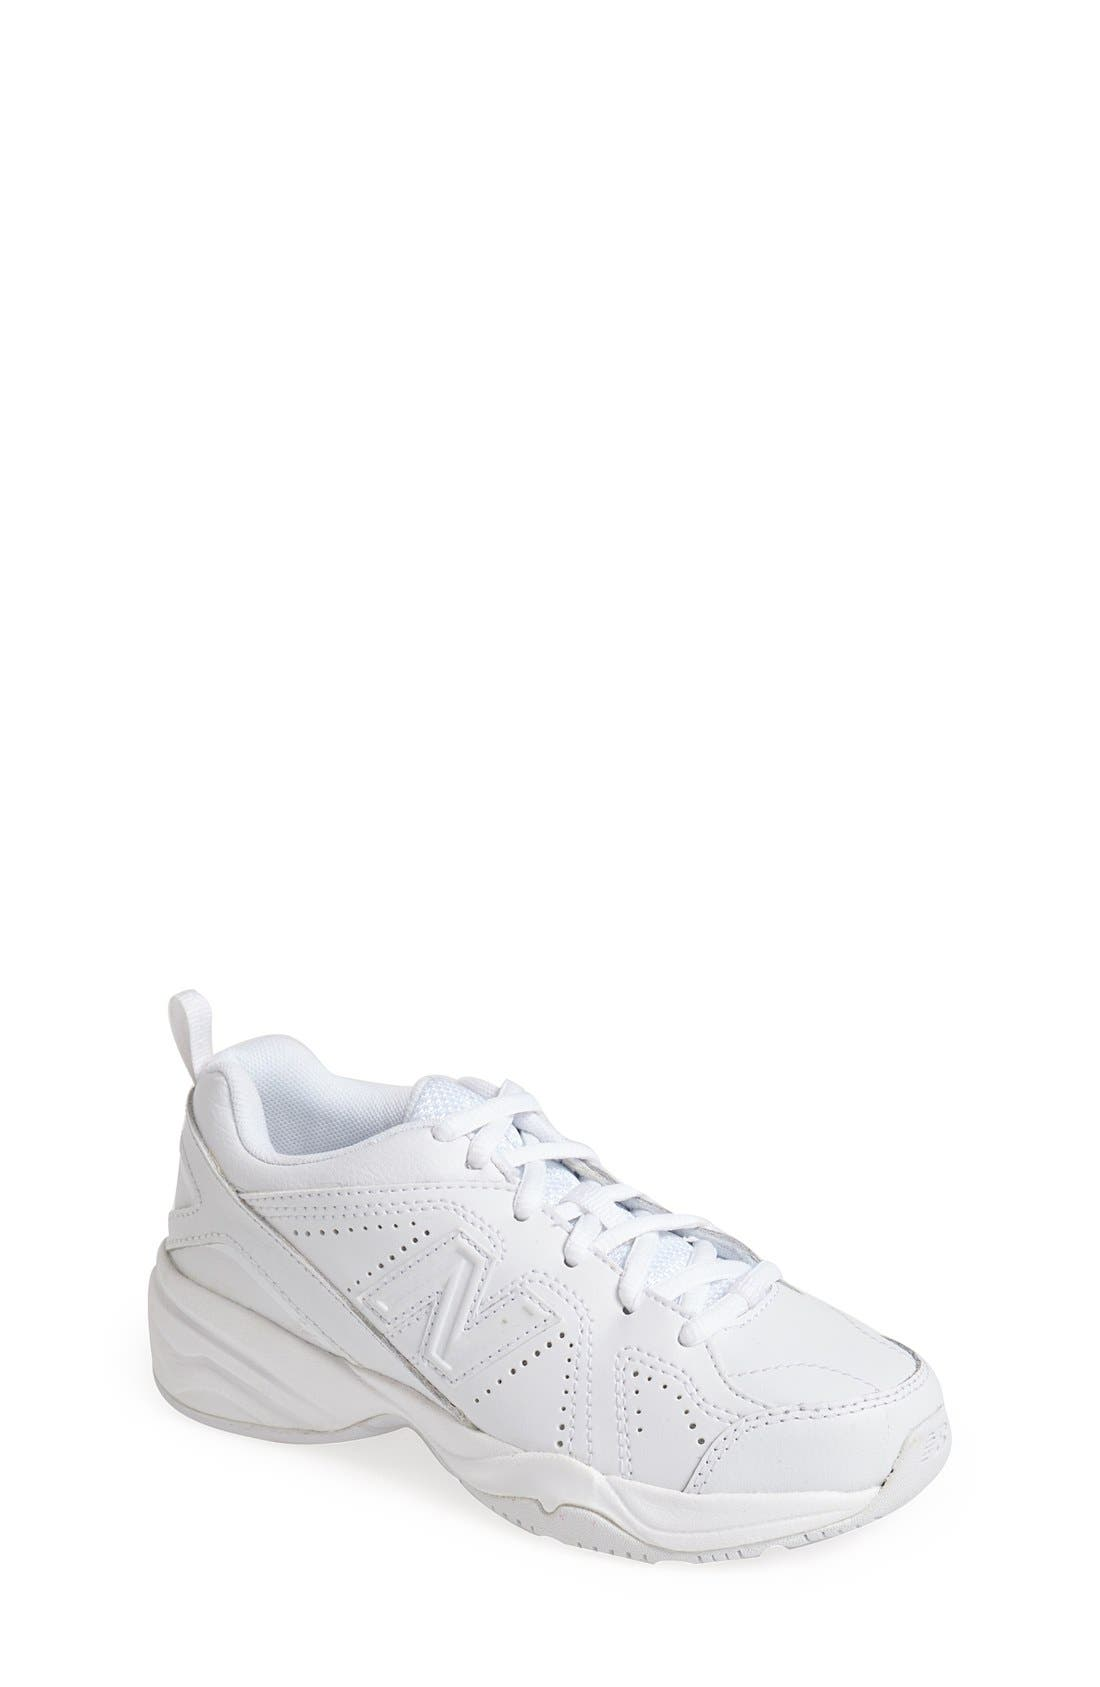 'Takedown 624v2' Sneaker,                         Main,                         color, 100